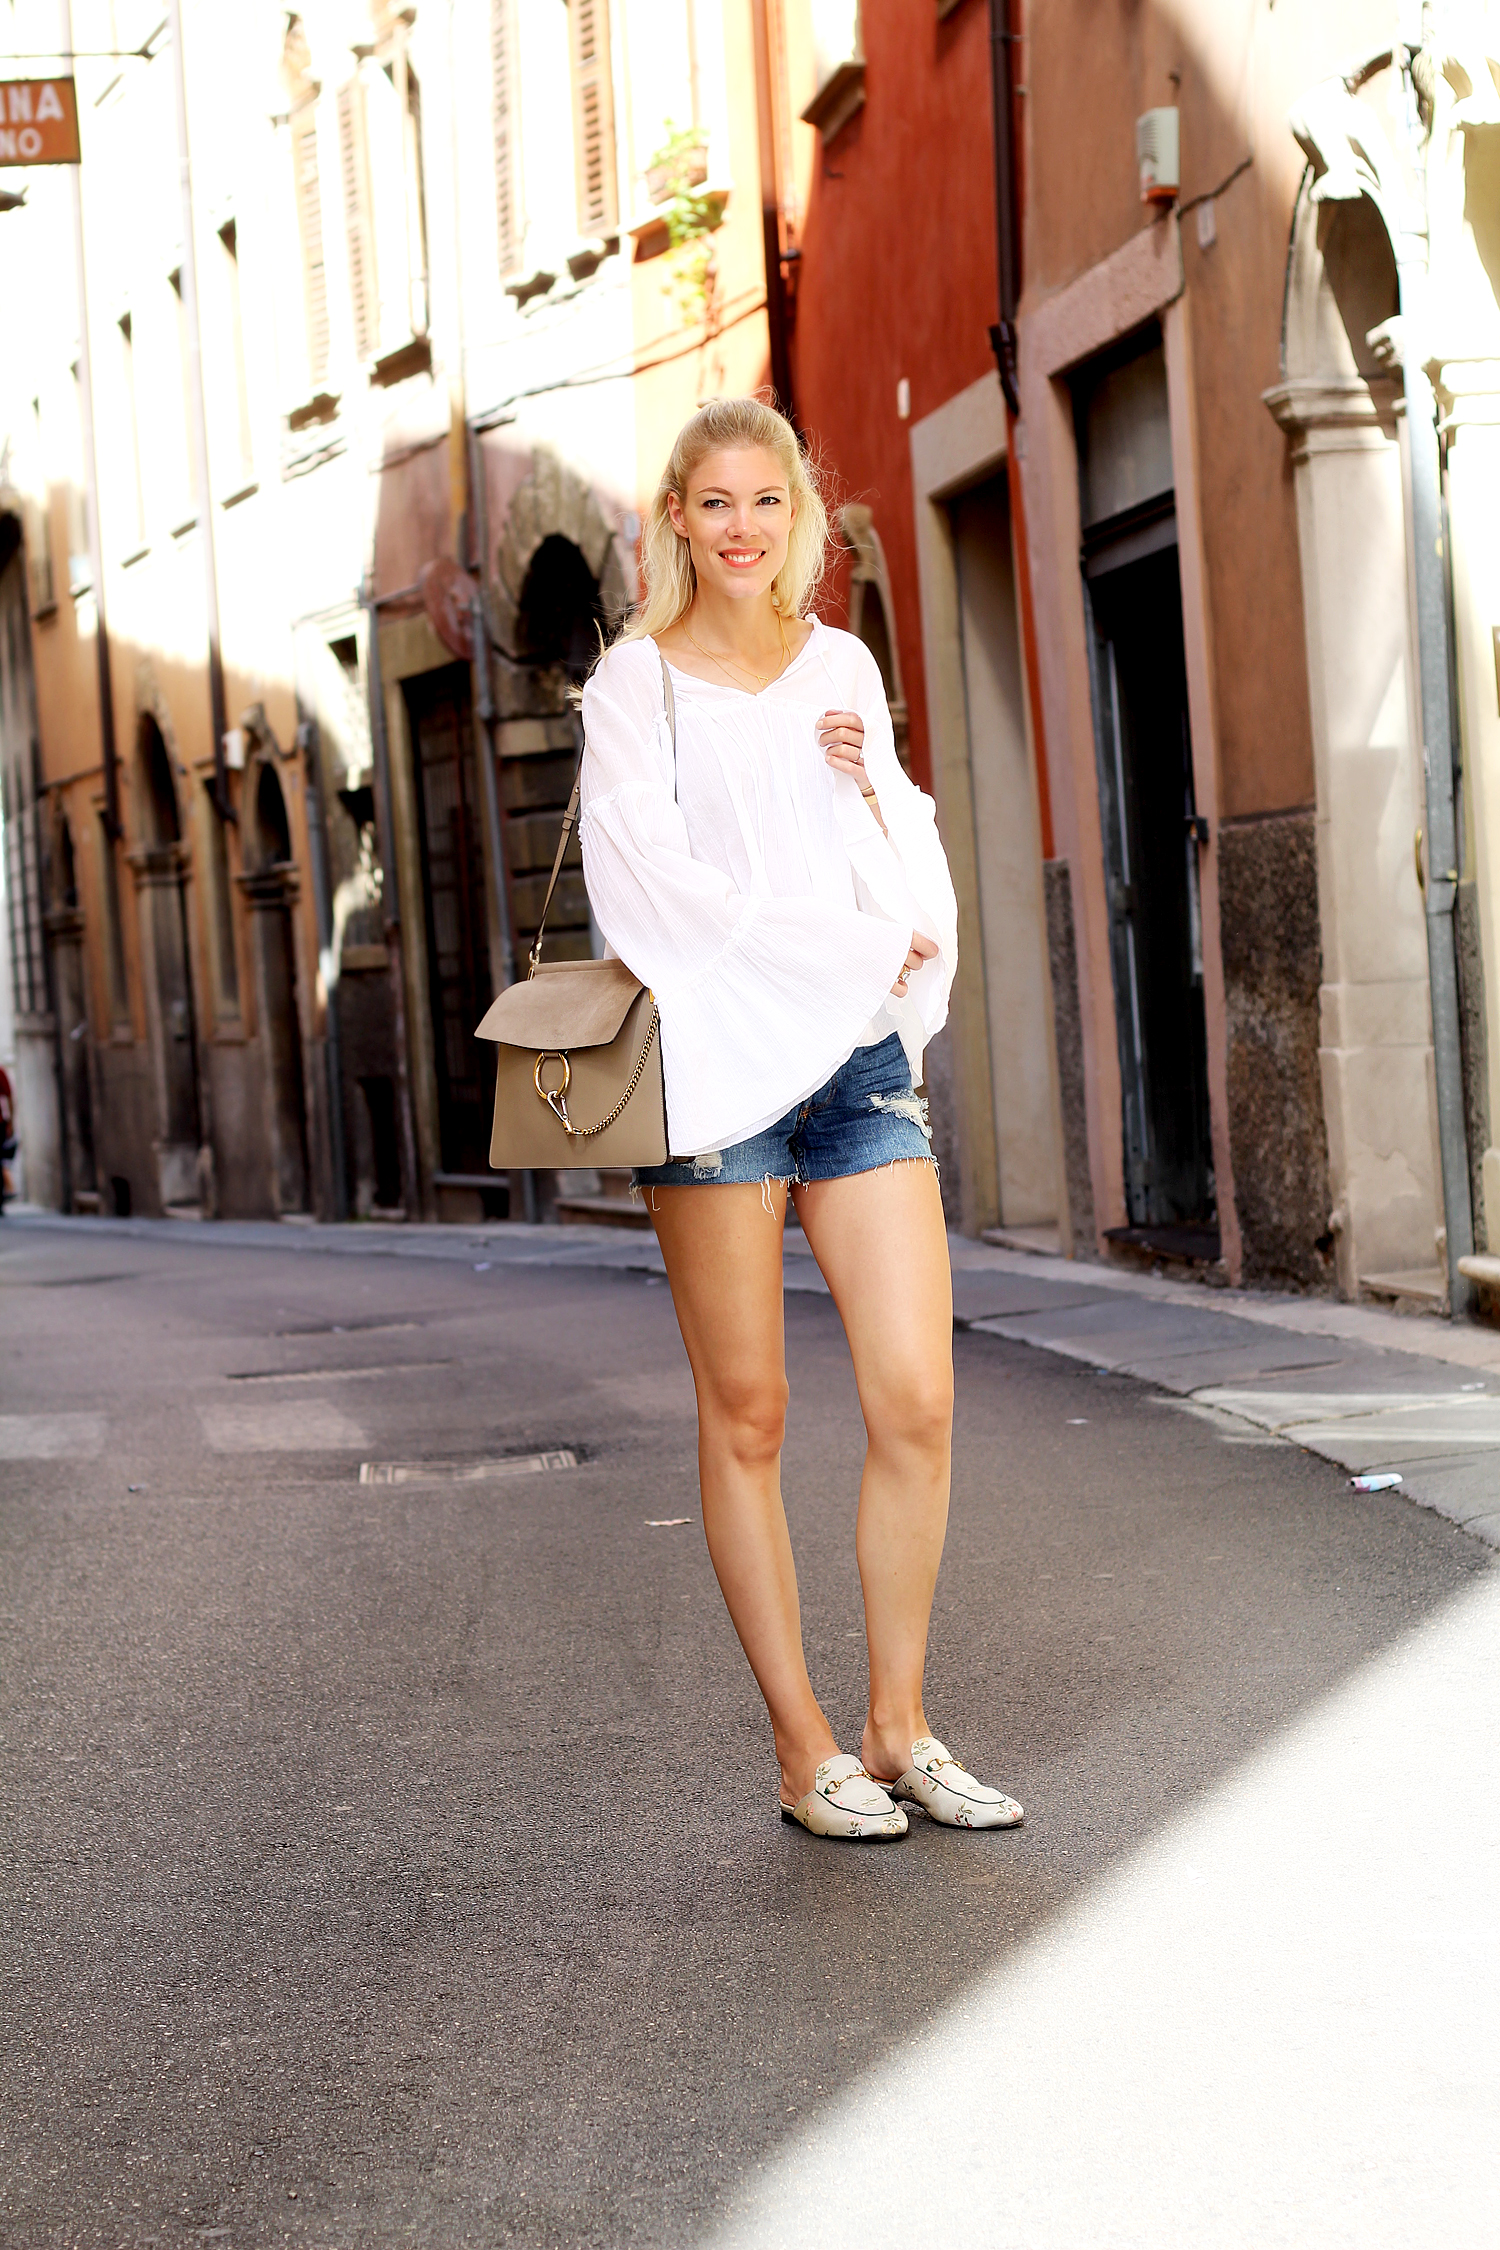 somehappyshoes_fashionblog_verona_look_chloe_hm_blouse